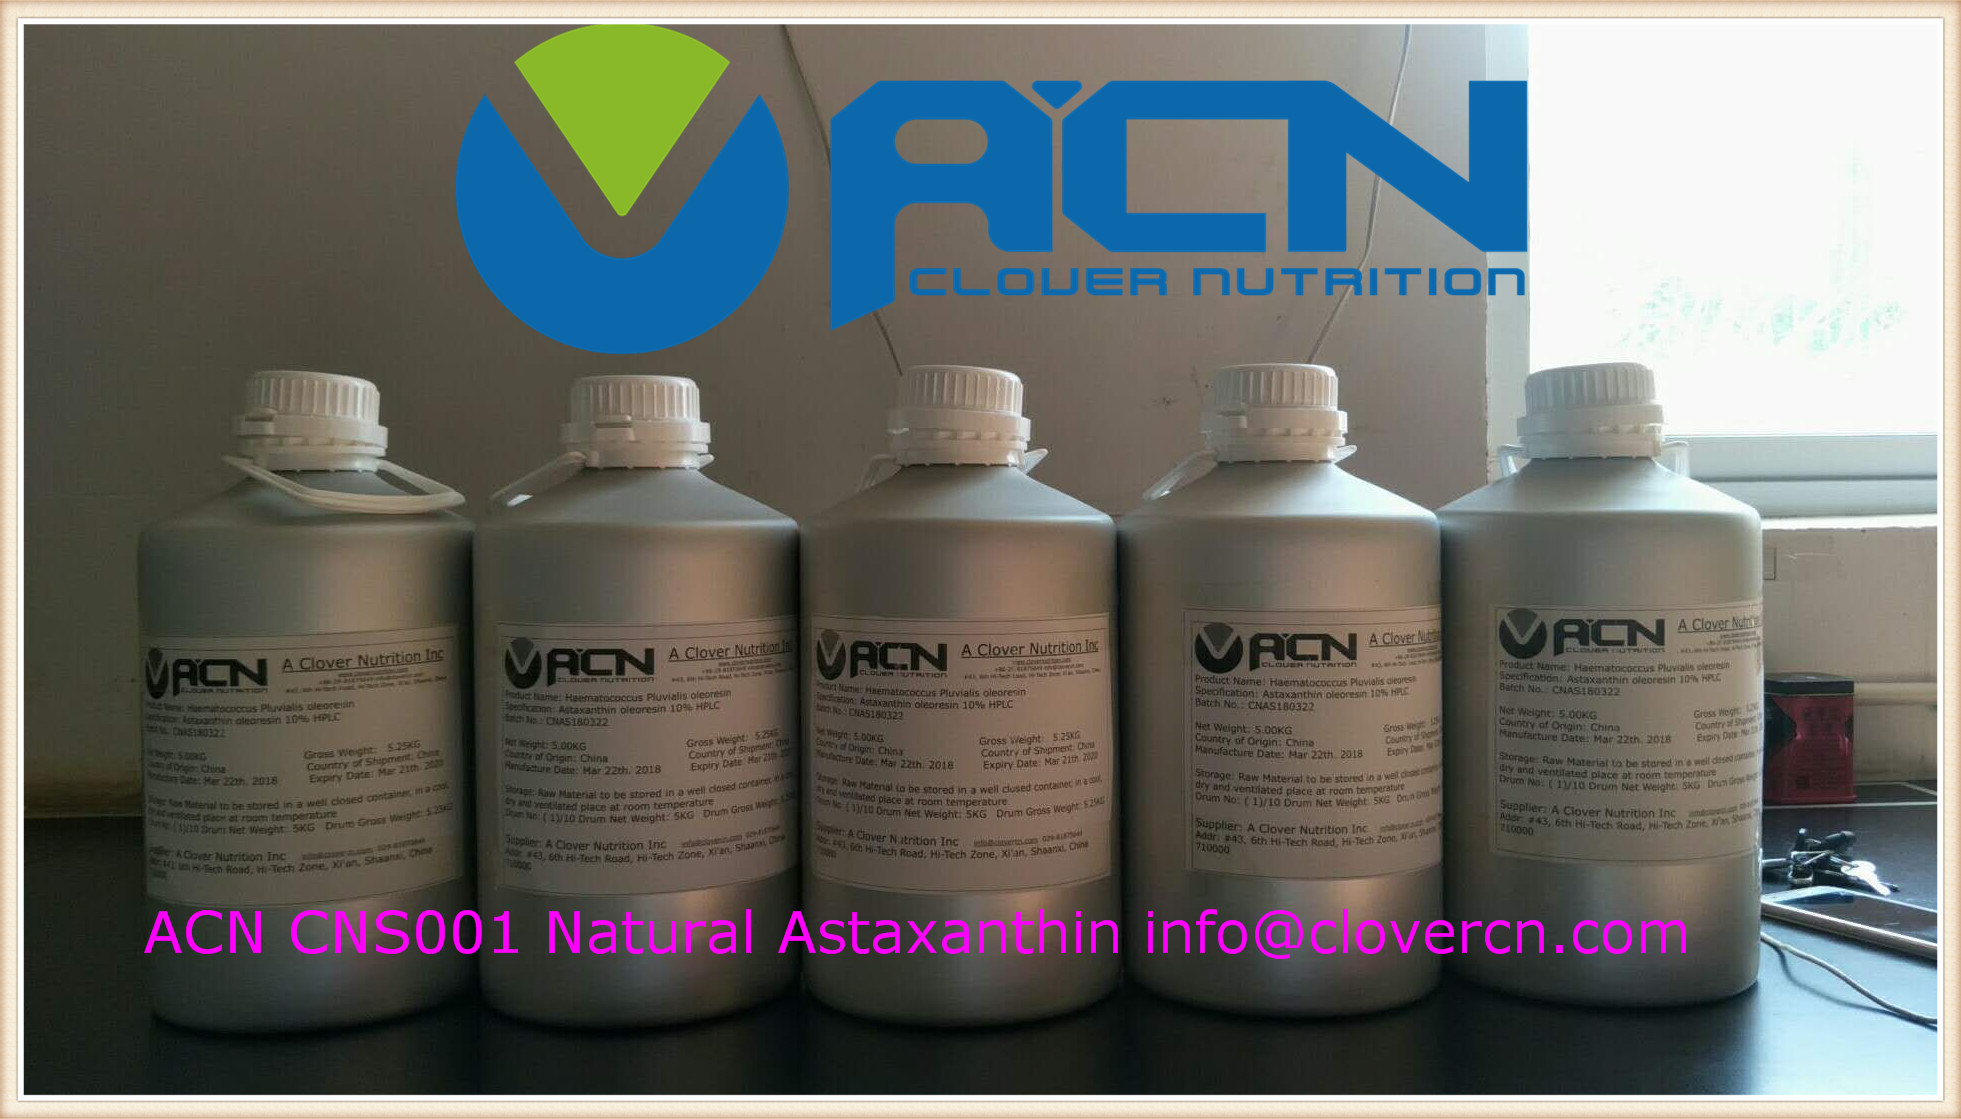 ACN CNS001 astaxanthin oil 10% info_clovercn.com